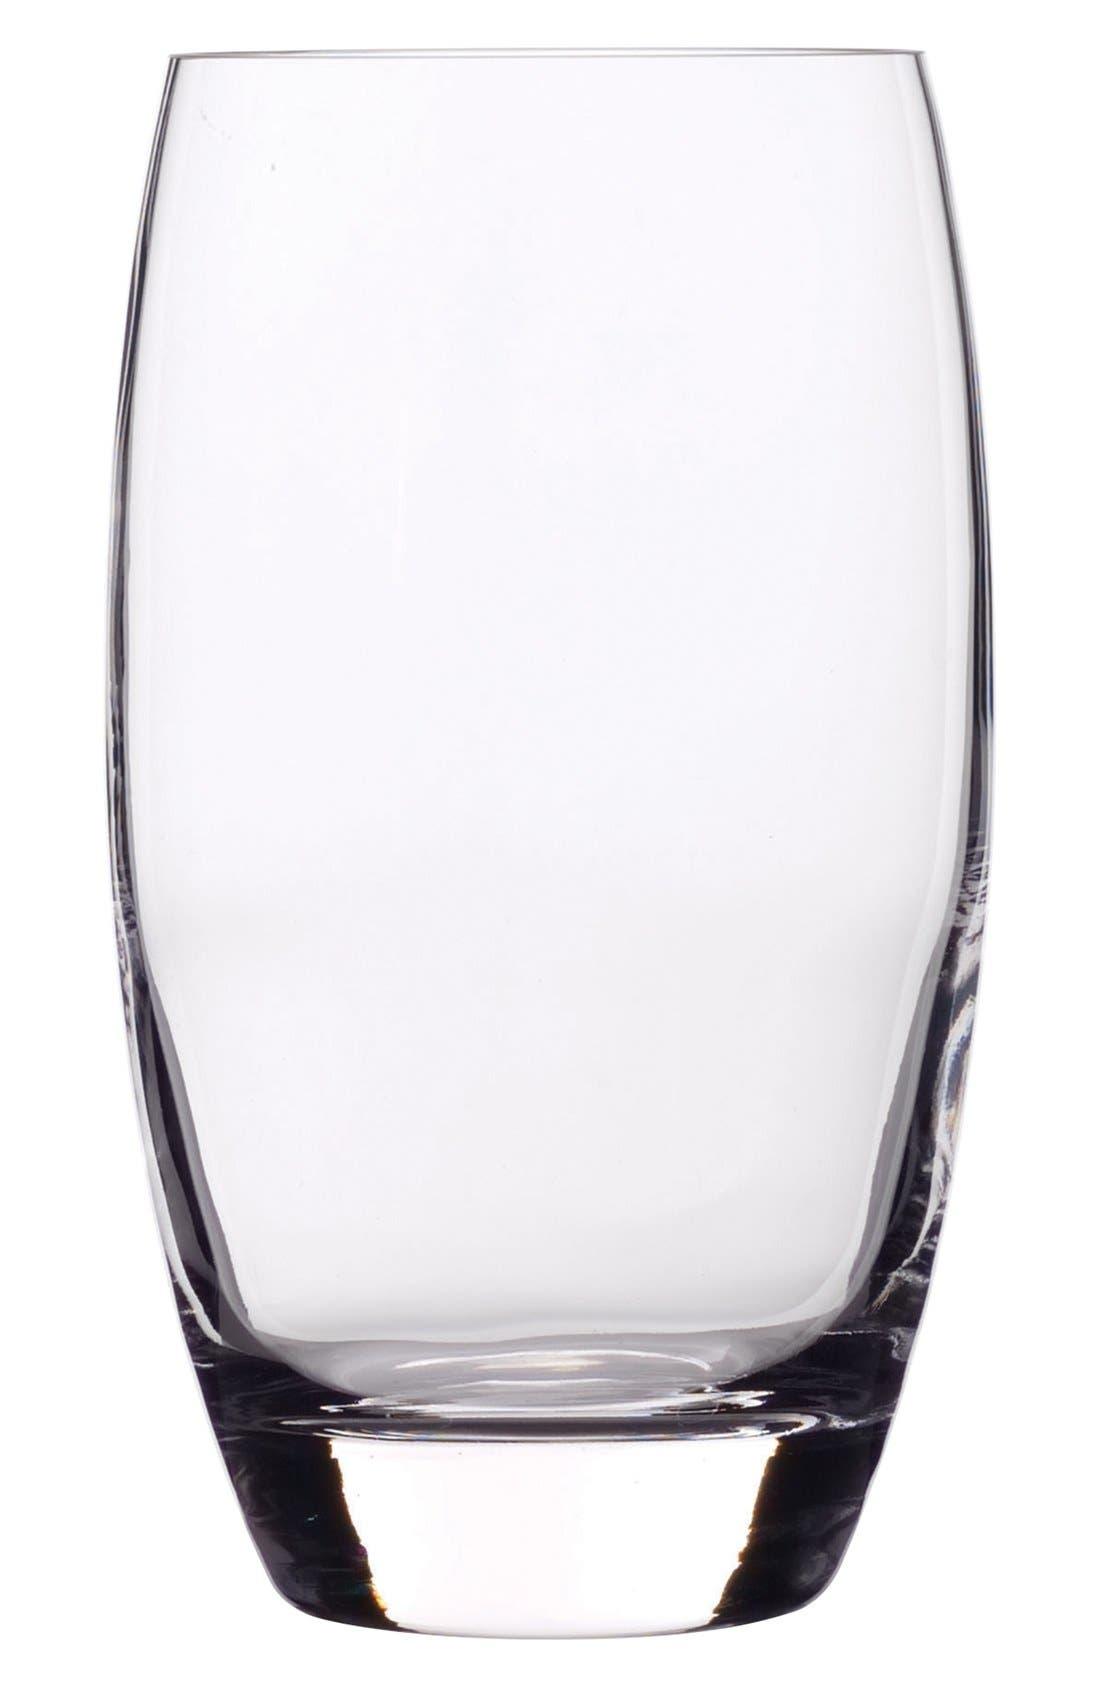 Luigi Bormioli 'Crescendo' Beverage Glasses (Set of 4)